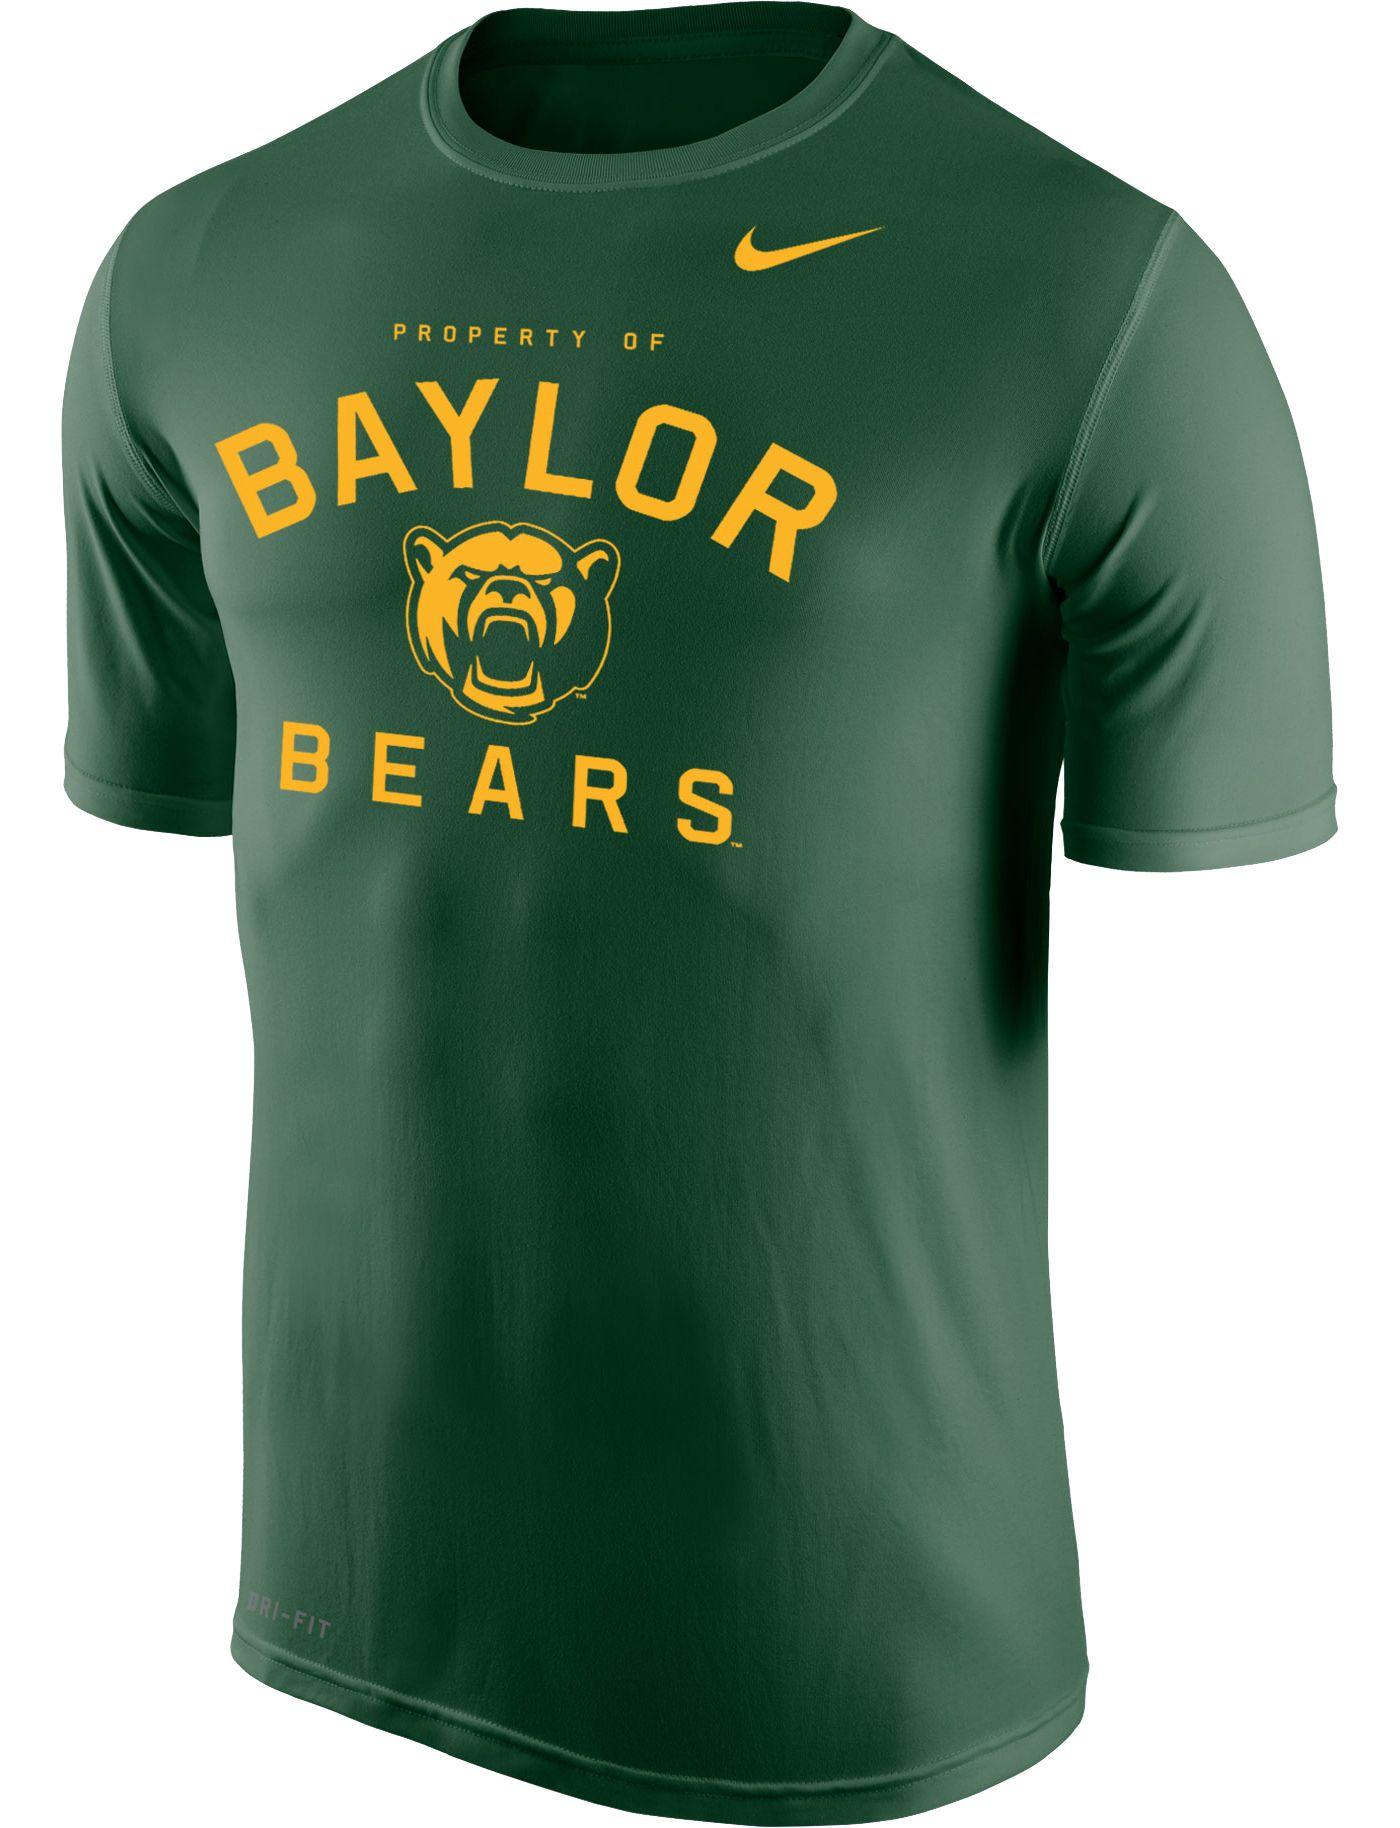 Nike Men's Baylor Bears Green 'Property Of' Dri-FIT Legend 2.0 T-Shirt